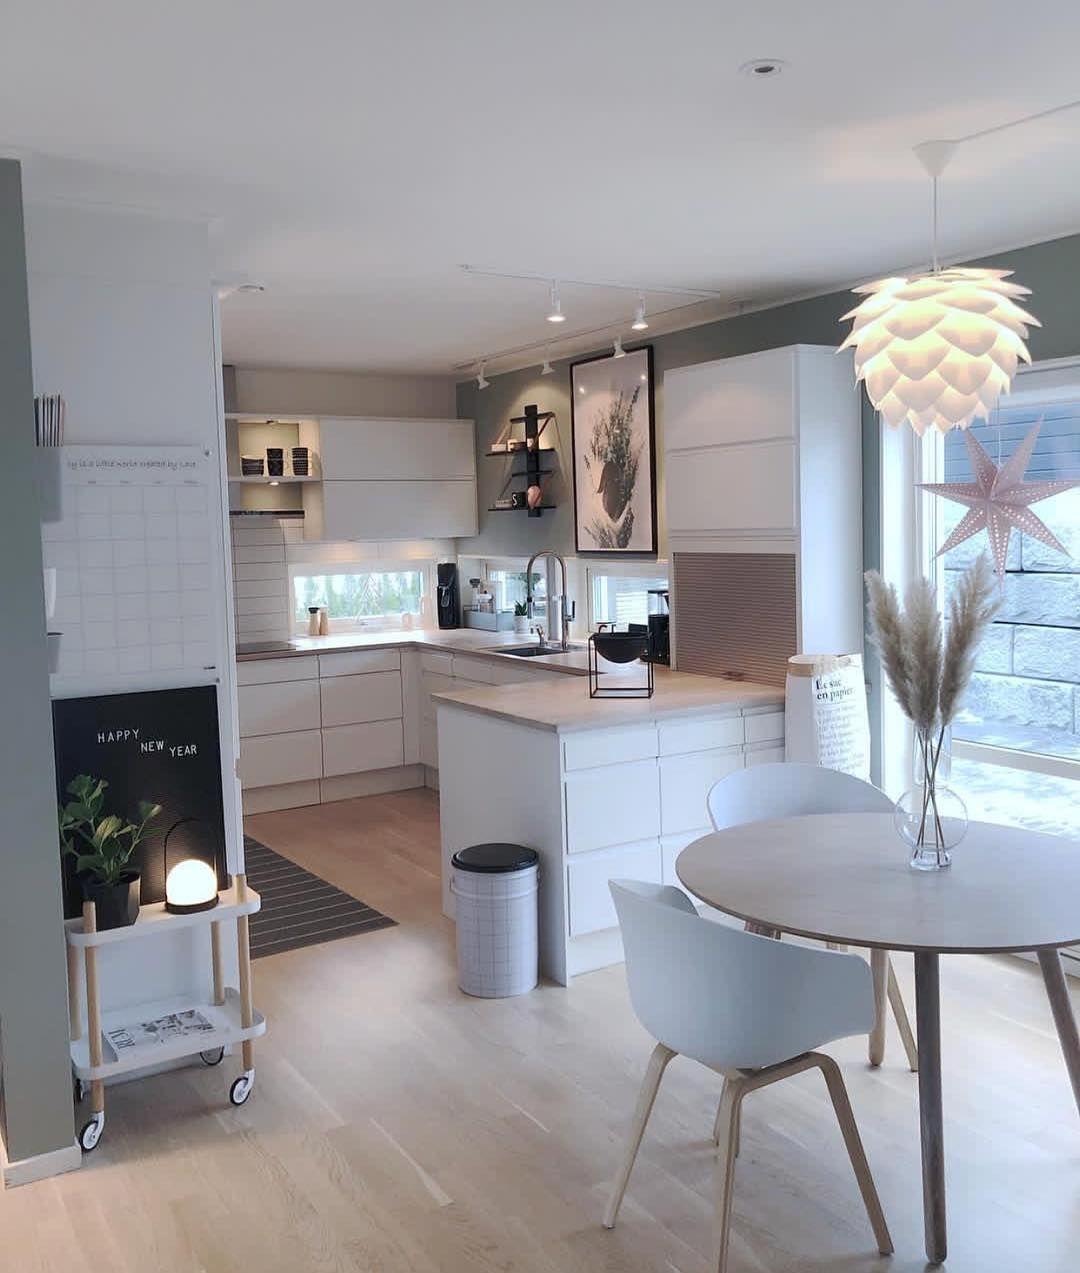 ▪️ Kitchen decor 💫 😍  Inspi @fruspilde _  #picoftheday #instalike #kitchen #kitchendesign #kitchendecor #kitchenview #homedecor #chicdesign…